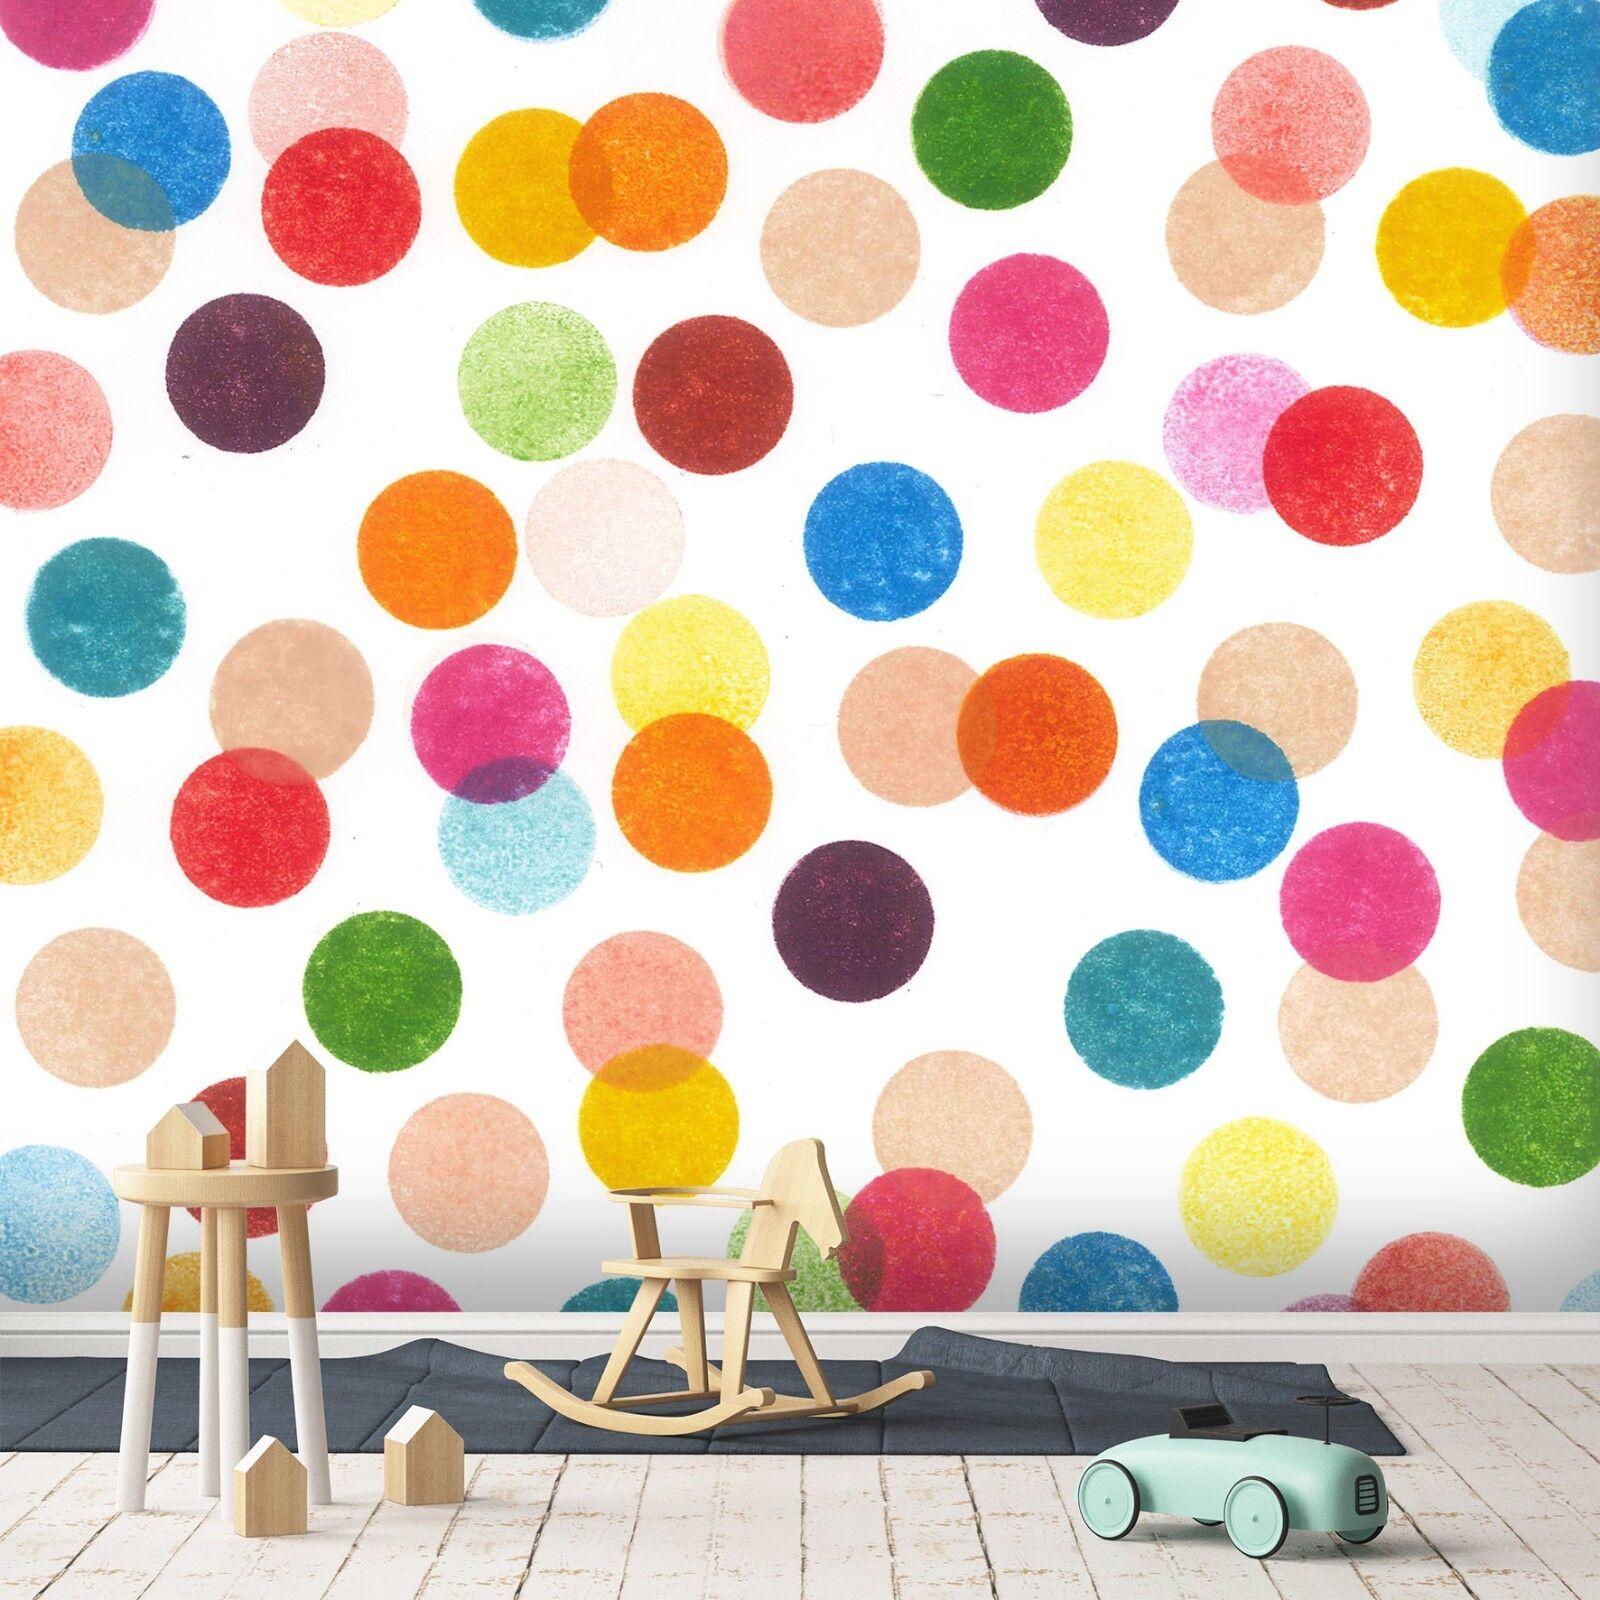 3D colorful Dot 870 Wallpaper Mural Paper Wall Print Indoor Murals CA Summer